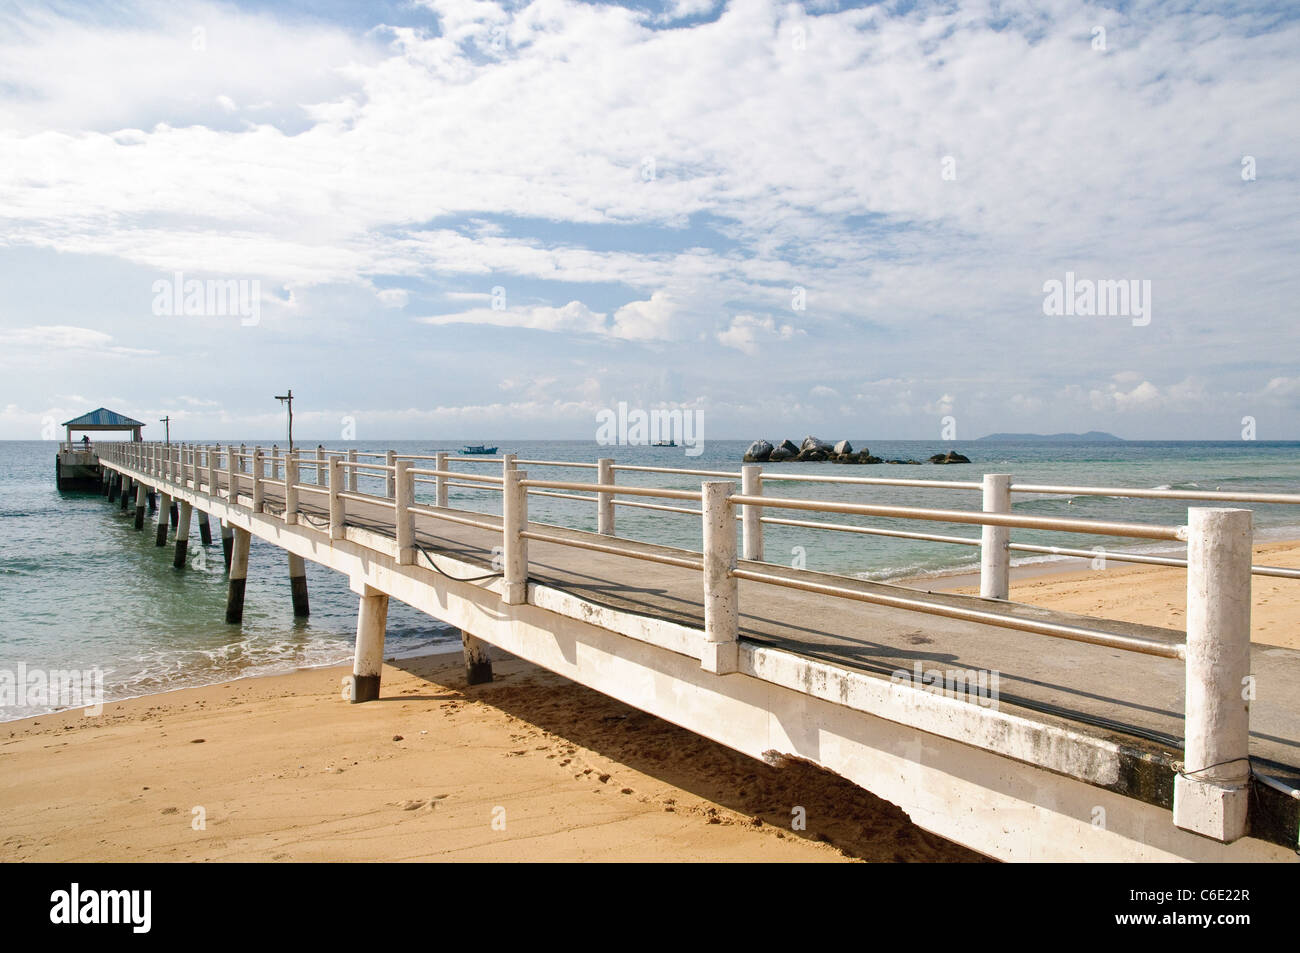 Pier on the beach of Paya, Pulau Tioman Island, Malaysia, Southeast Asia, Asia Stock Photo